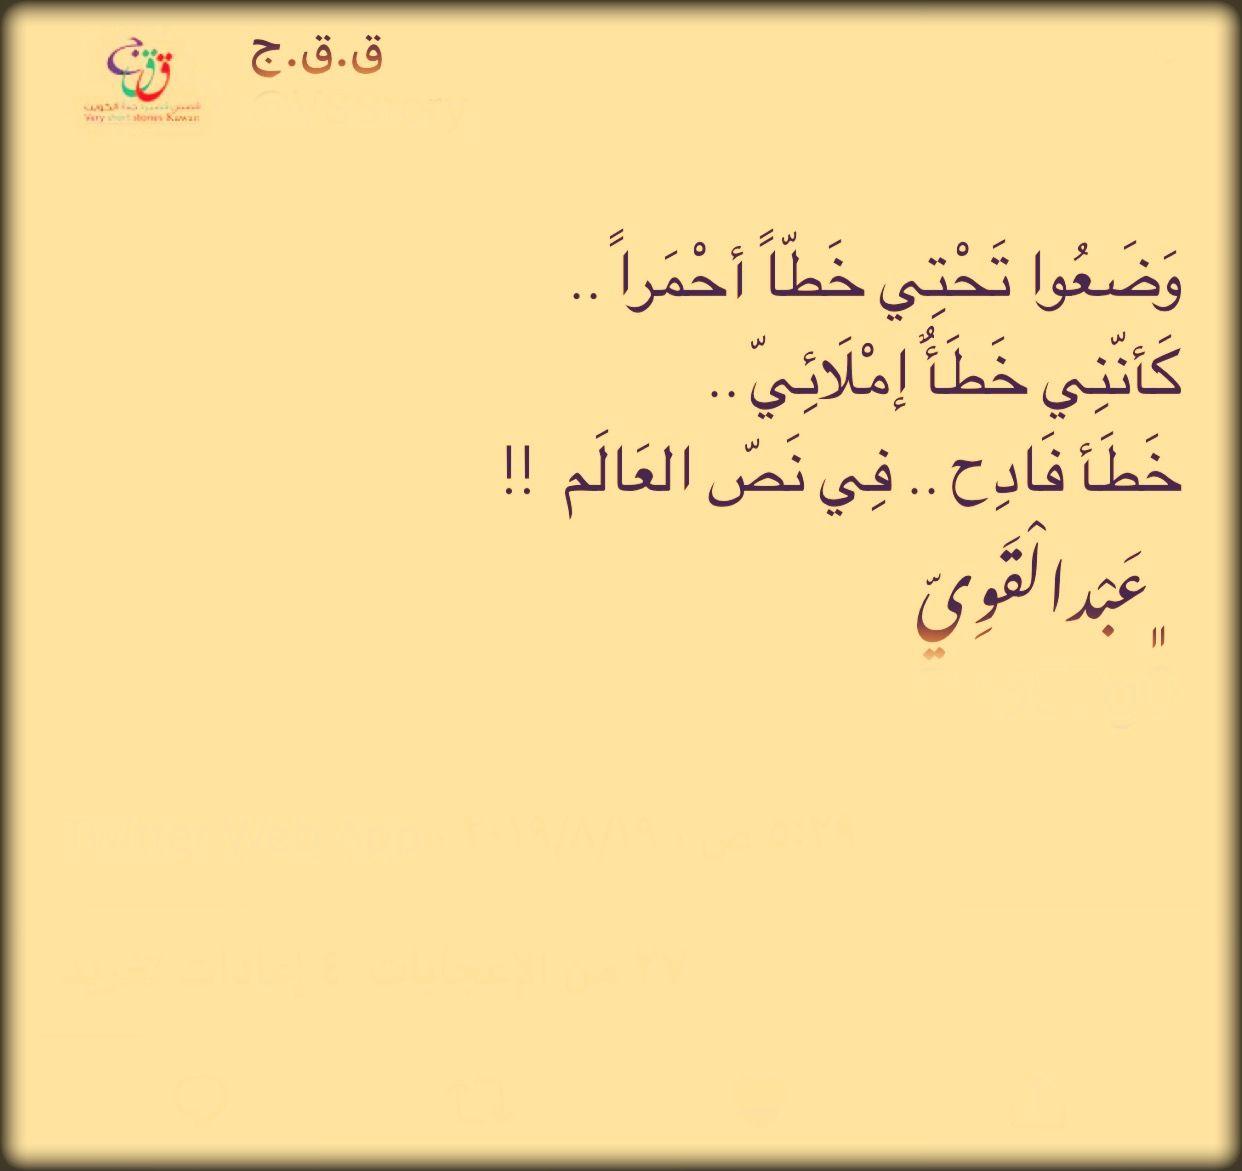 قصة قصيرة جدا Calligraphy Arabic Calligraphy Arabic